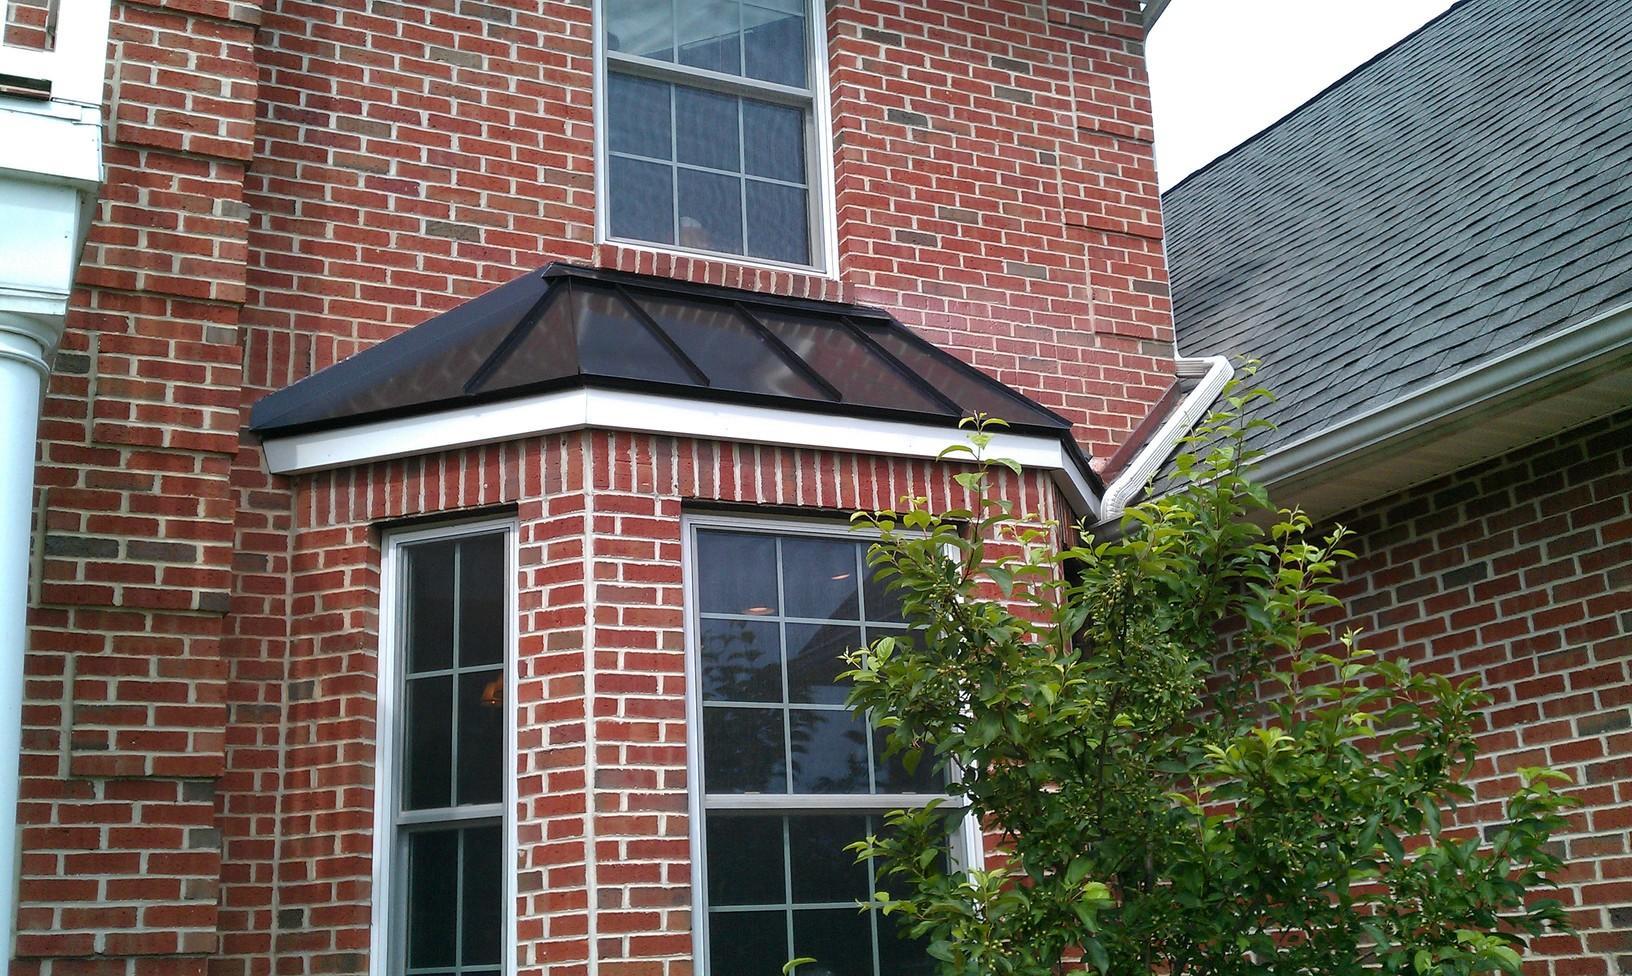 Installing Custom-Shaped Matte Black Standing Seam Metal Roof over Bay Window